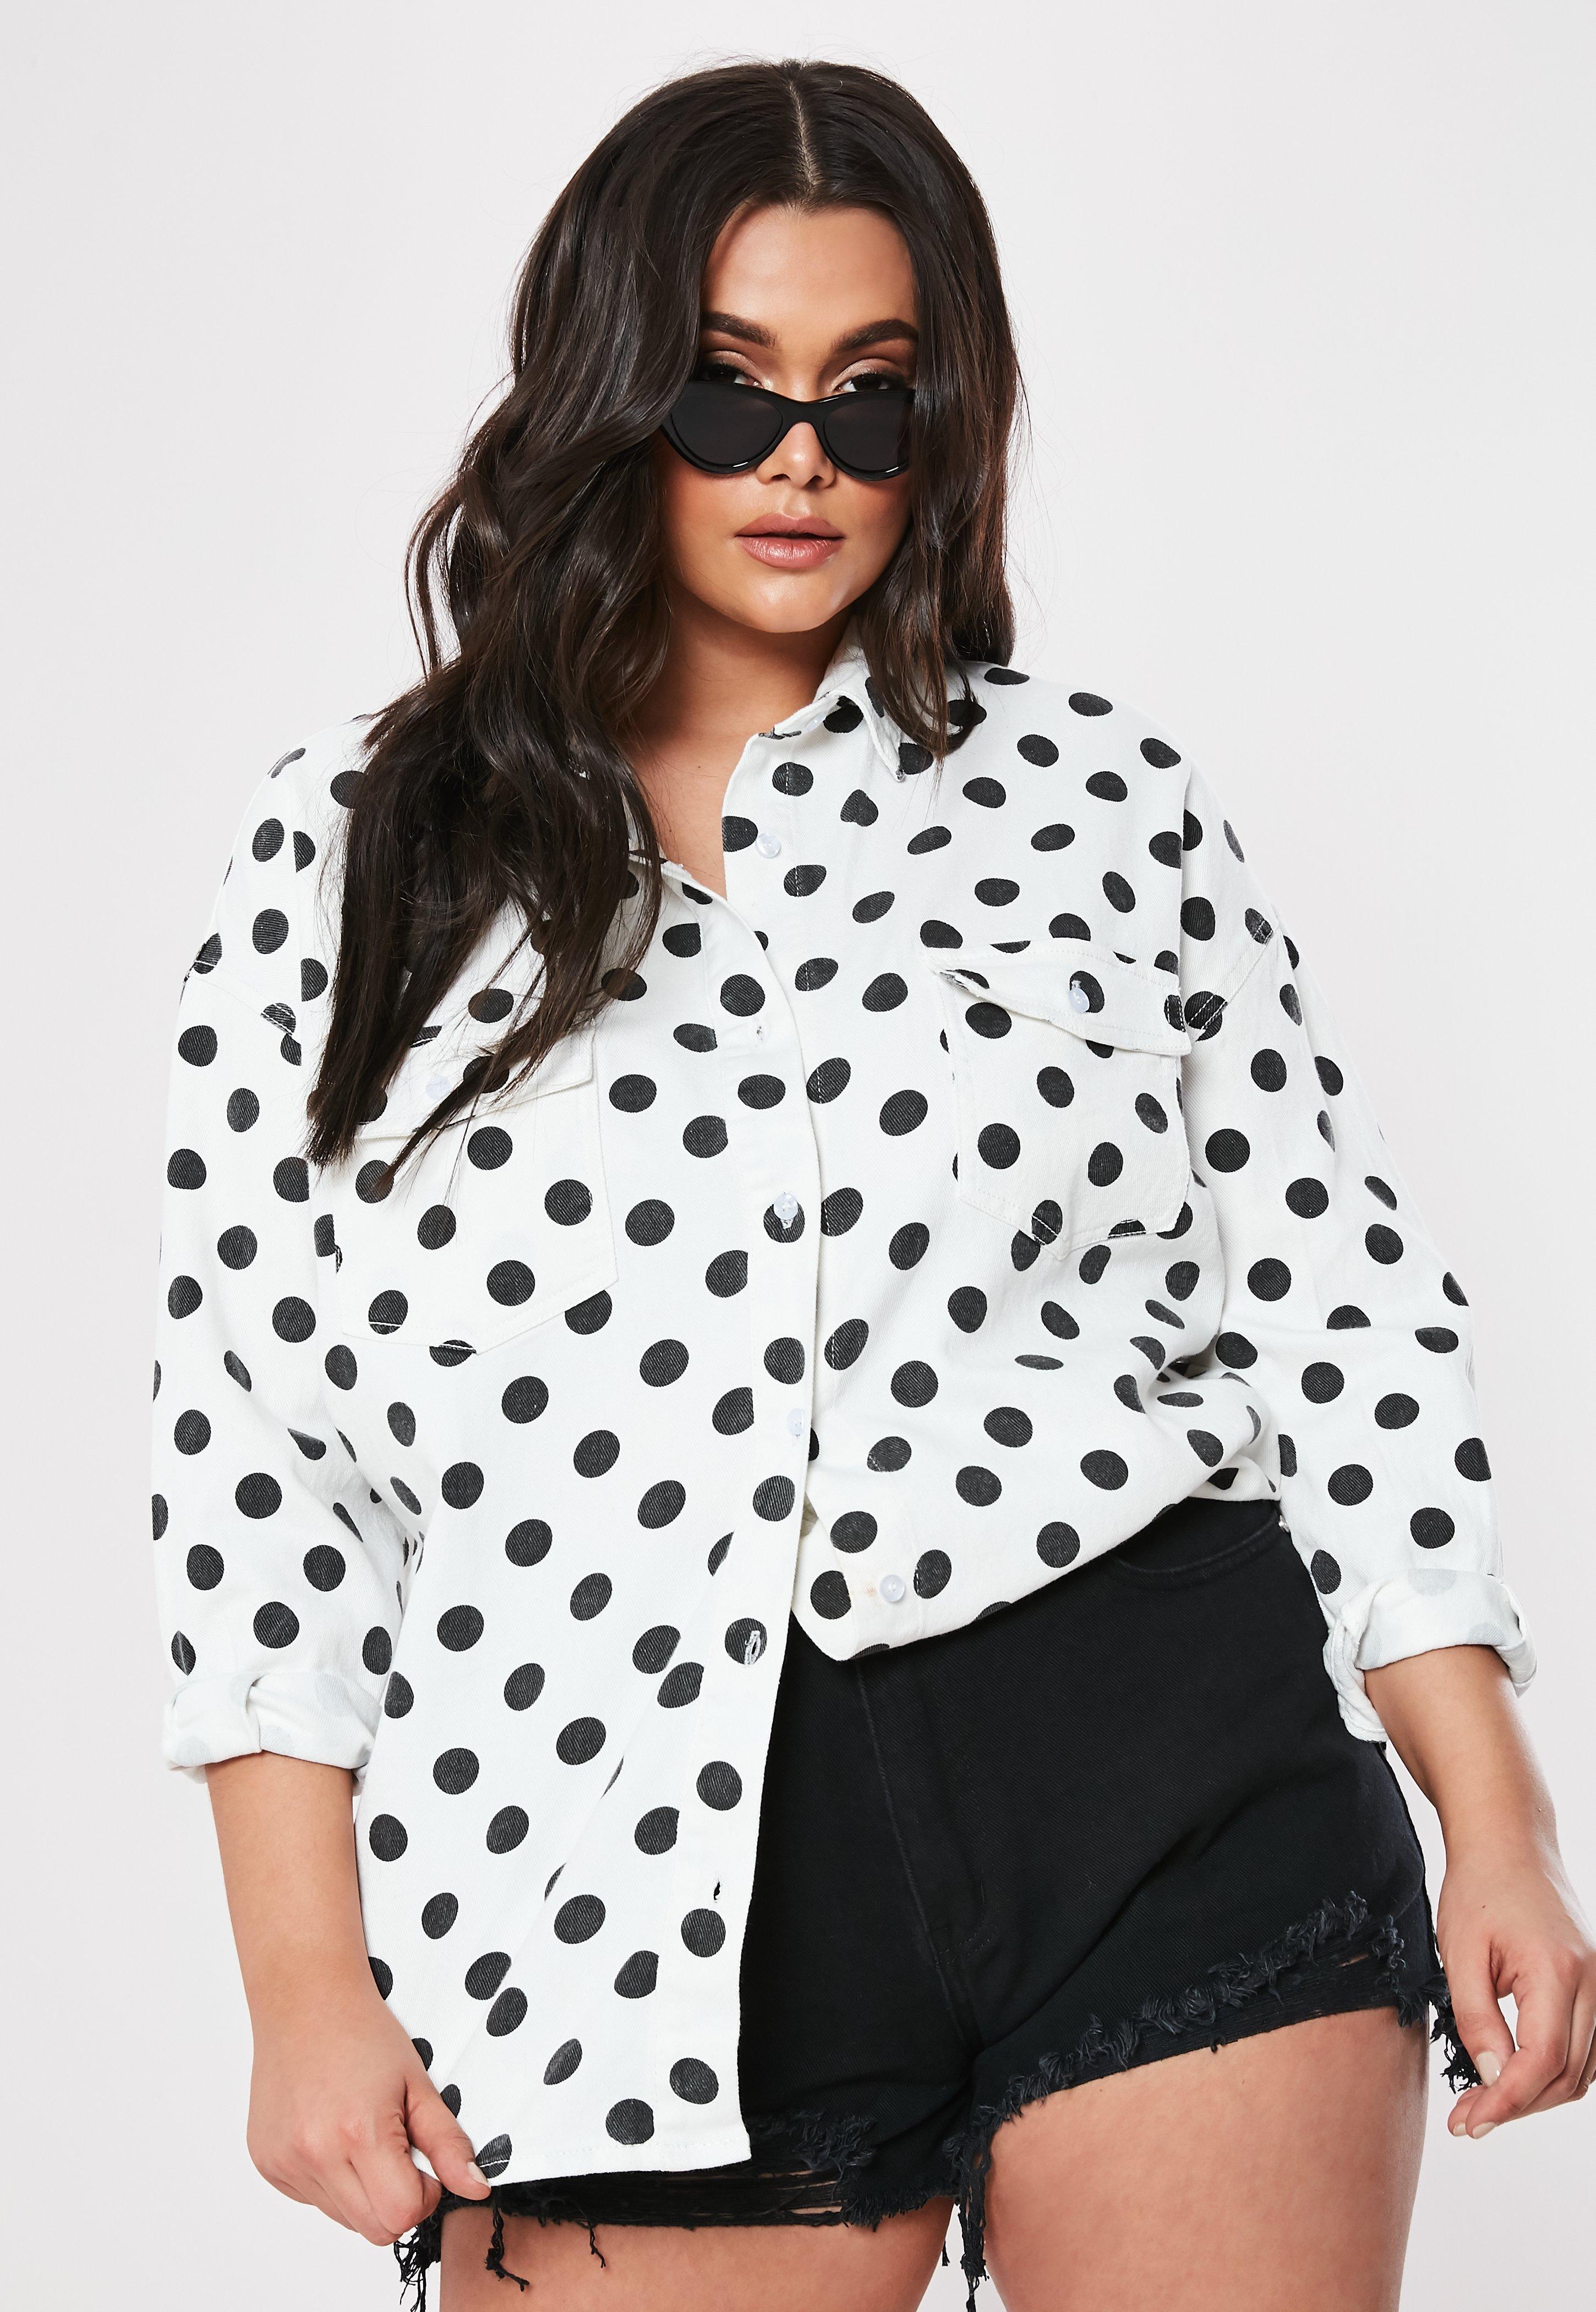 72f16a530c0bce Women's Shirts | Satin & Oversized Shirts - Missguided